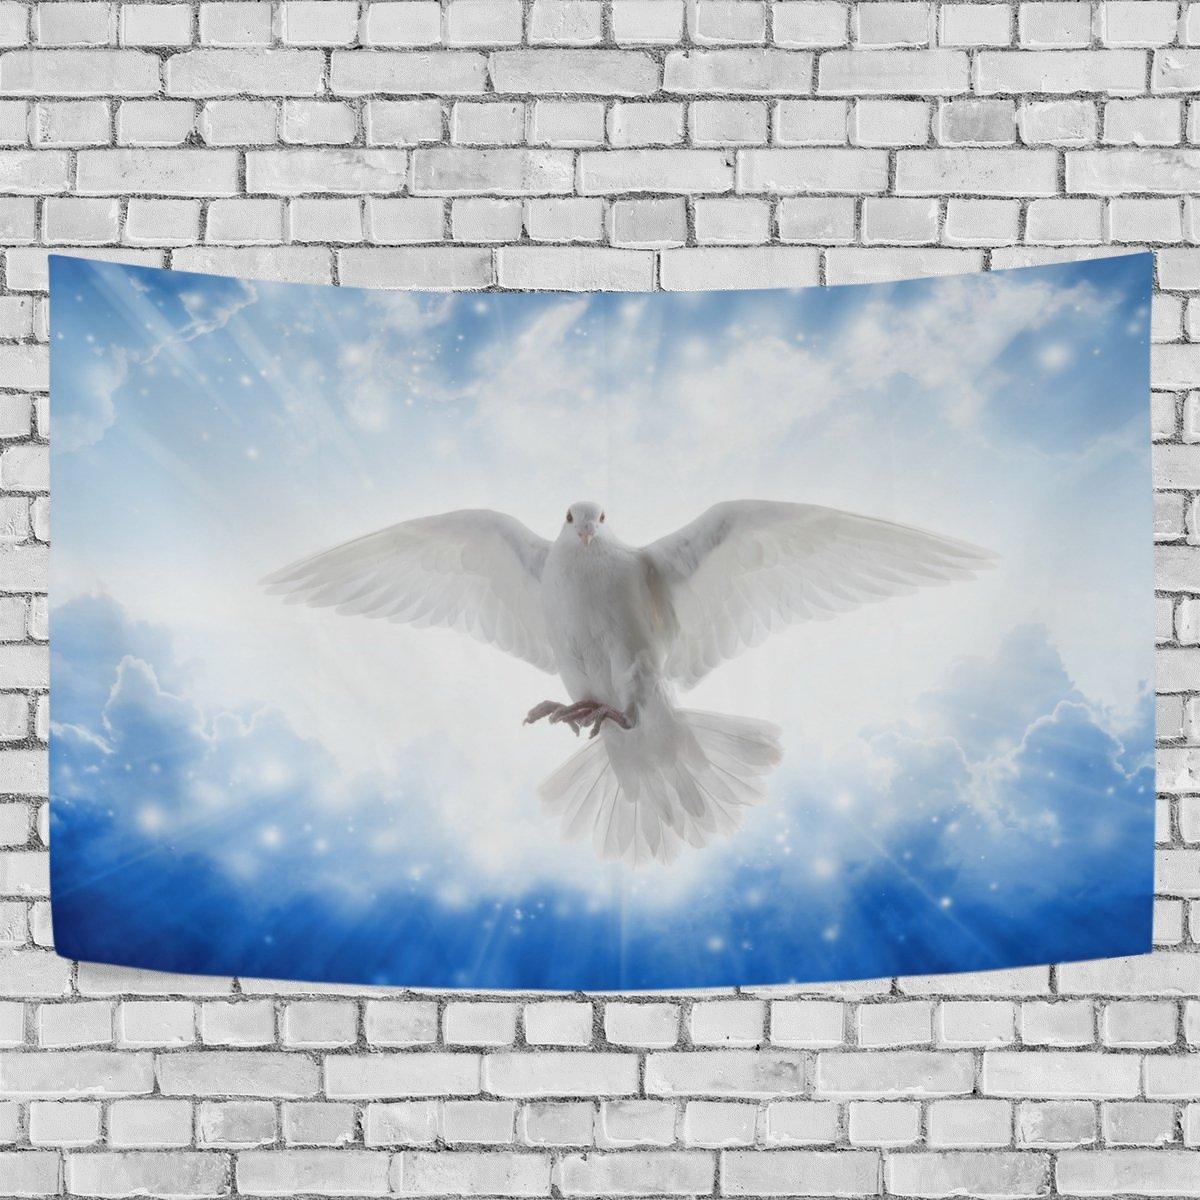 aureliorタペストリー壁Hangingホーム装飾、Holy Spirit Bird Flying Sky Bright light shines from Heavenタペストリー壁装飾アートのリビングルームベッドルーム寮の部屋60 x 40 cm 80 X 60 Inches g3391888p125c139s207   B07BK1WNCF